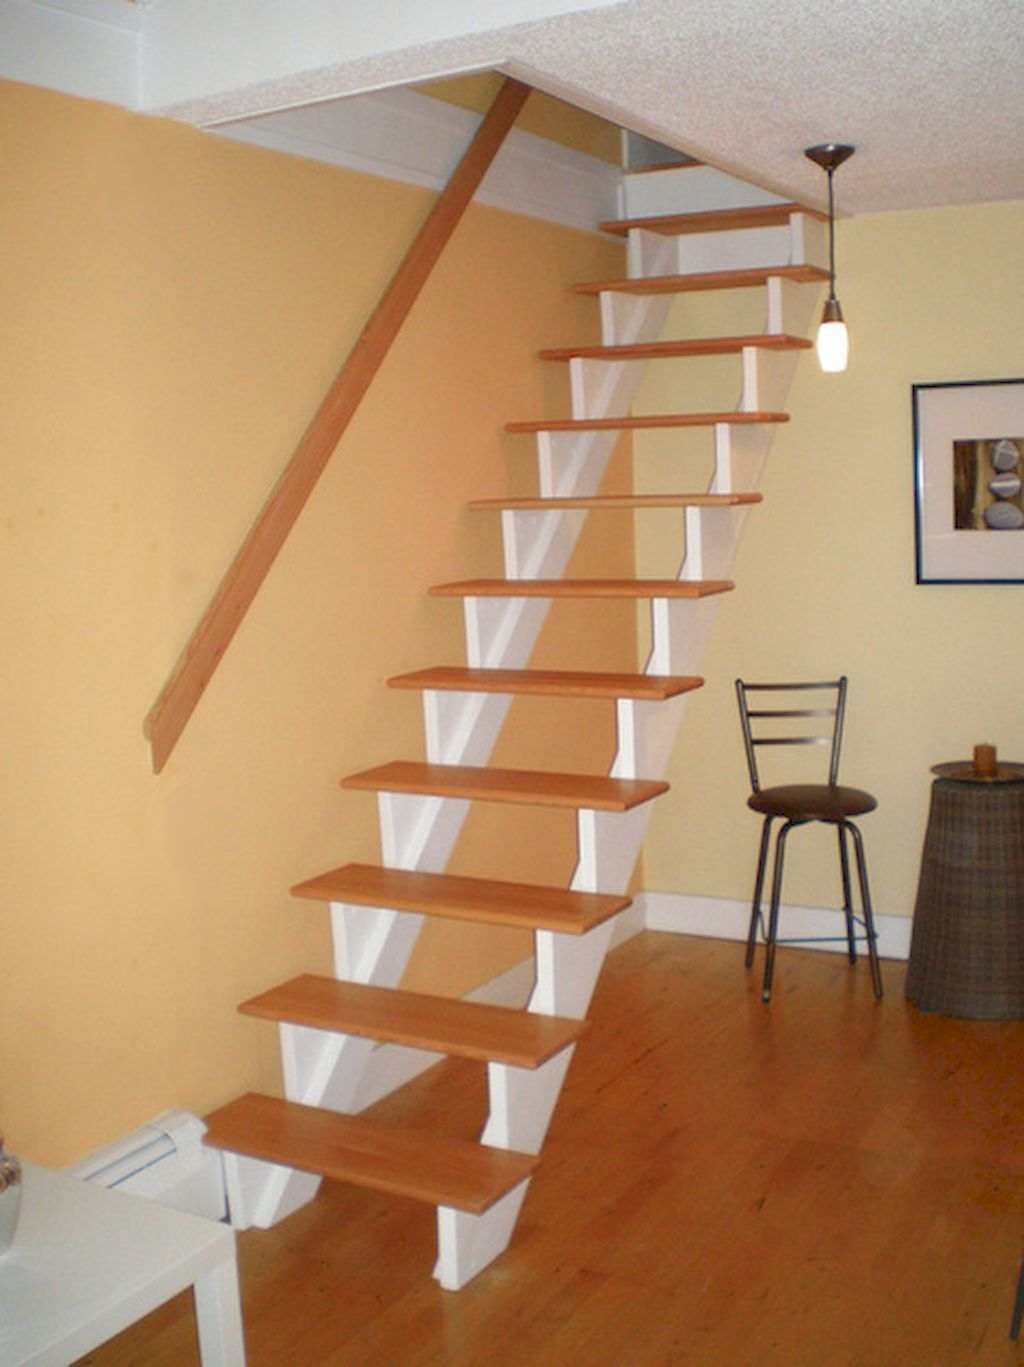 Amazing Loft Stair for Tiny House Ideas (14 Tiny house